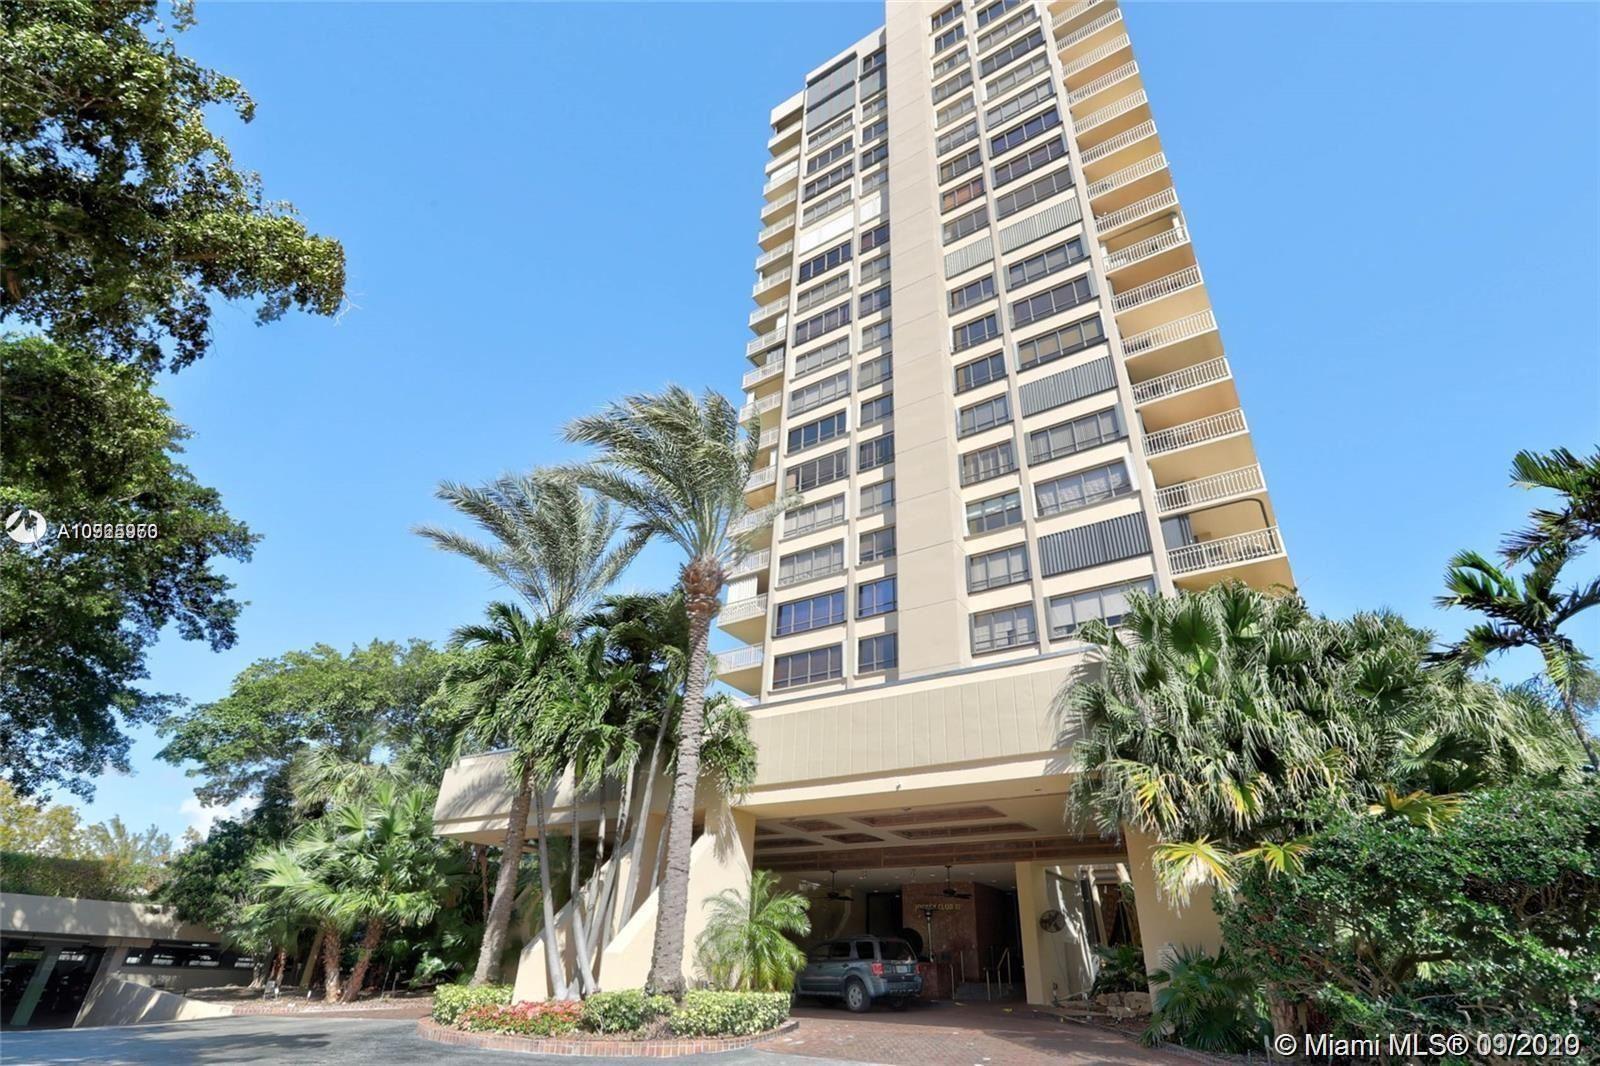 11111 Biscayne Blvd #2F, Miami, FL 33181 - #: A10925970